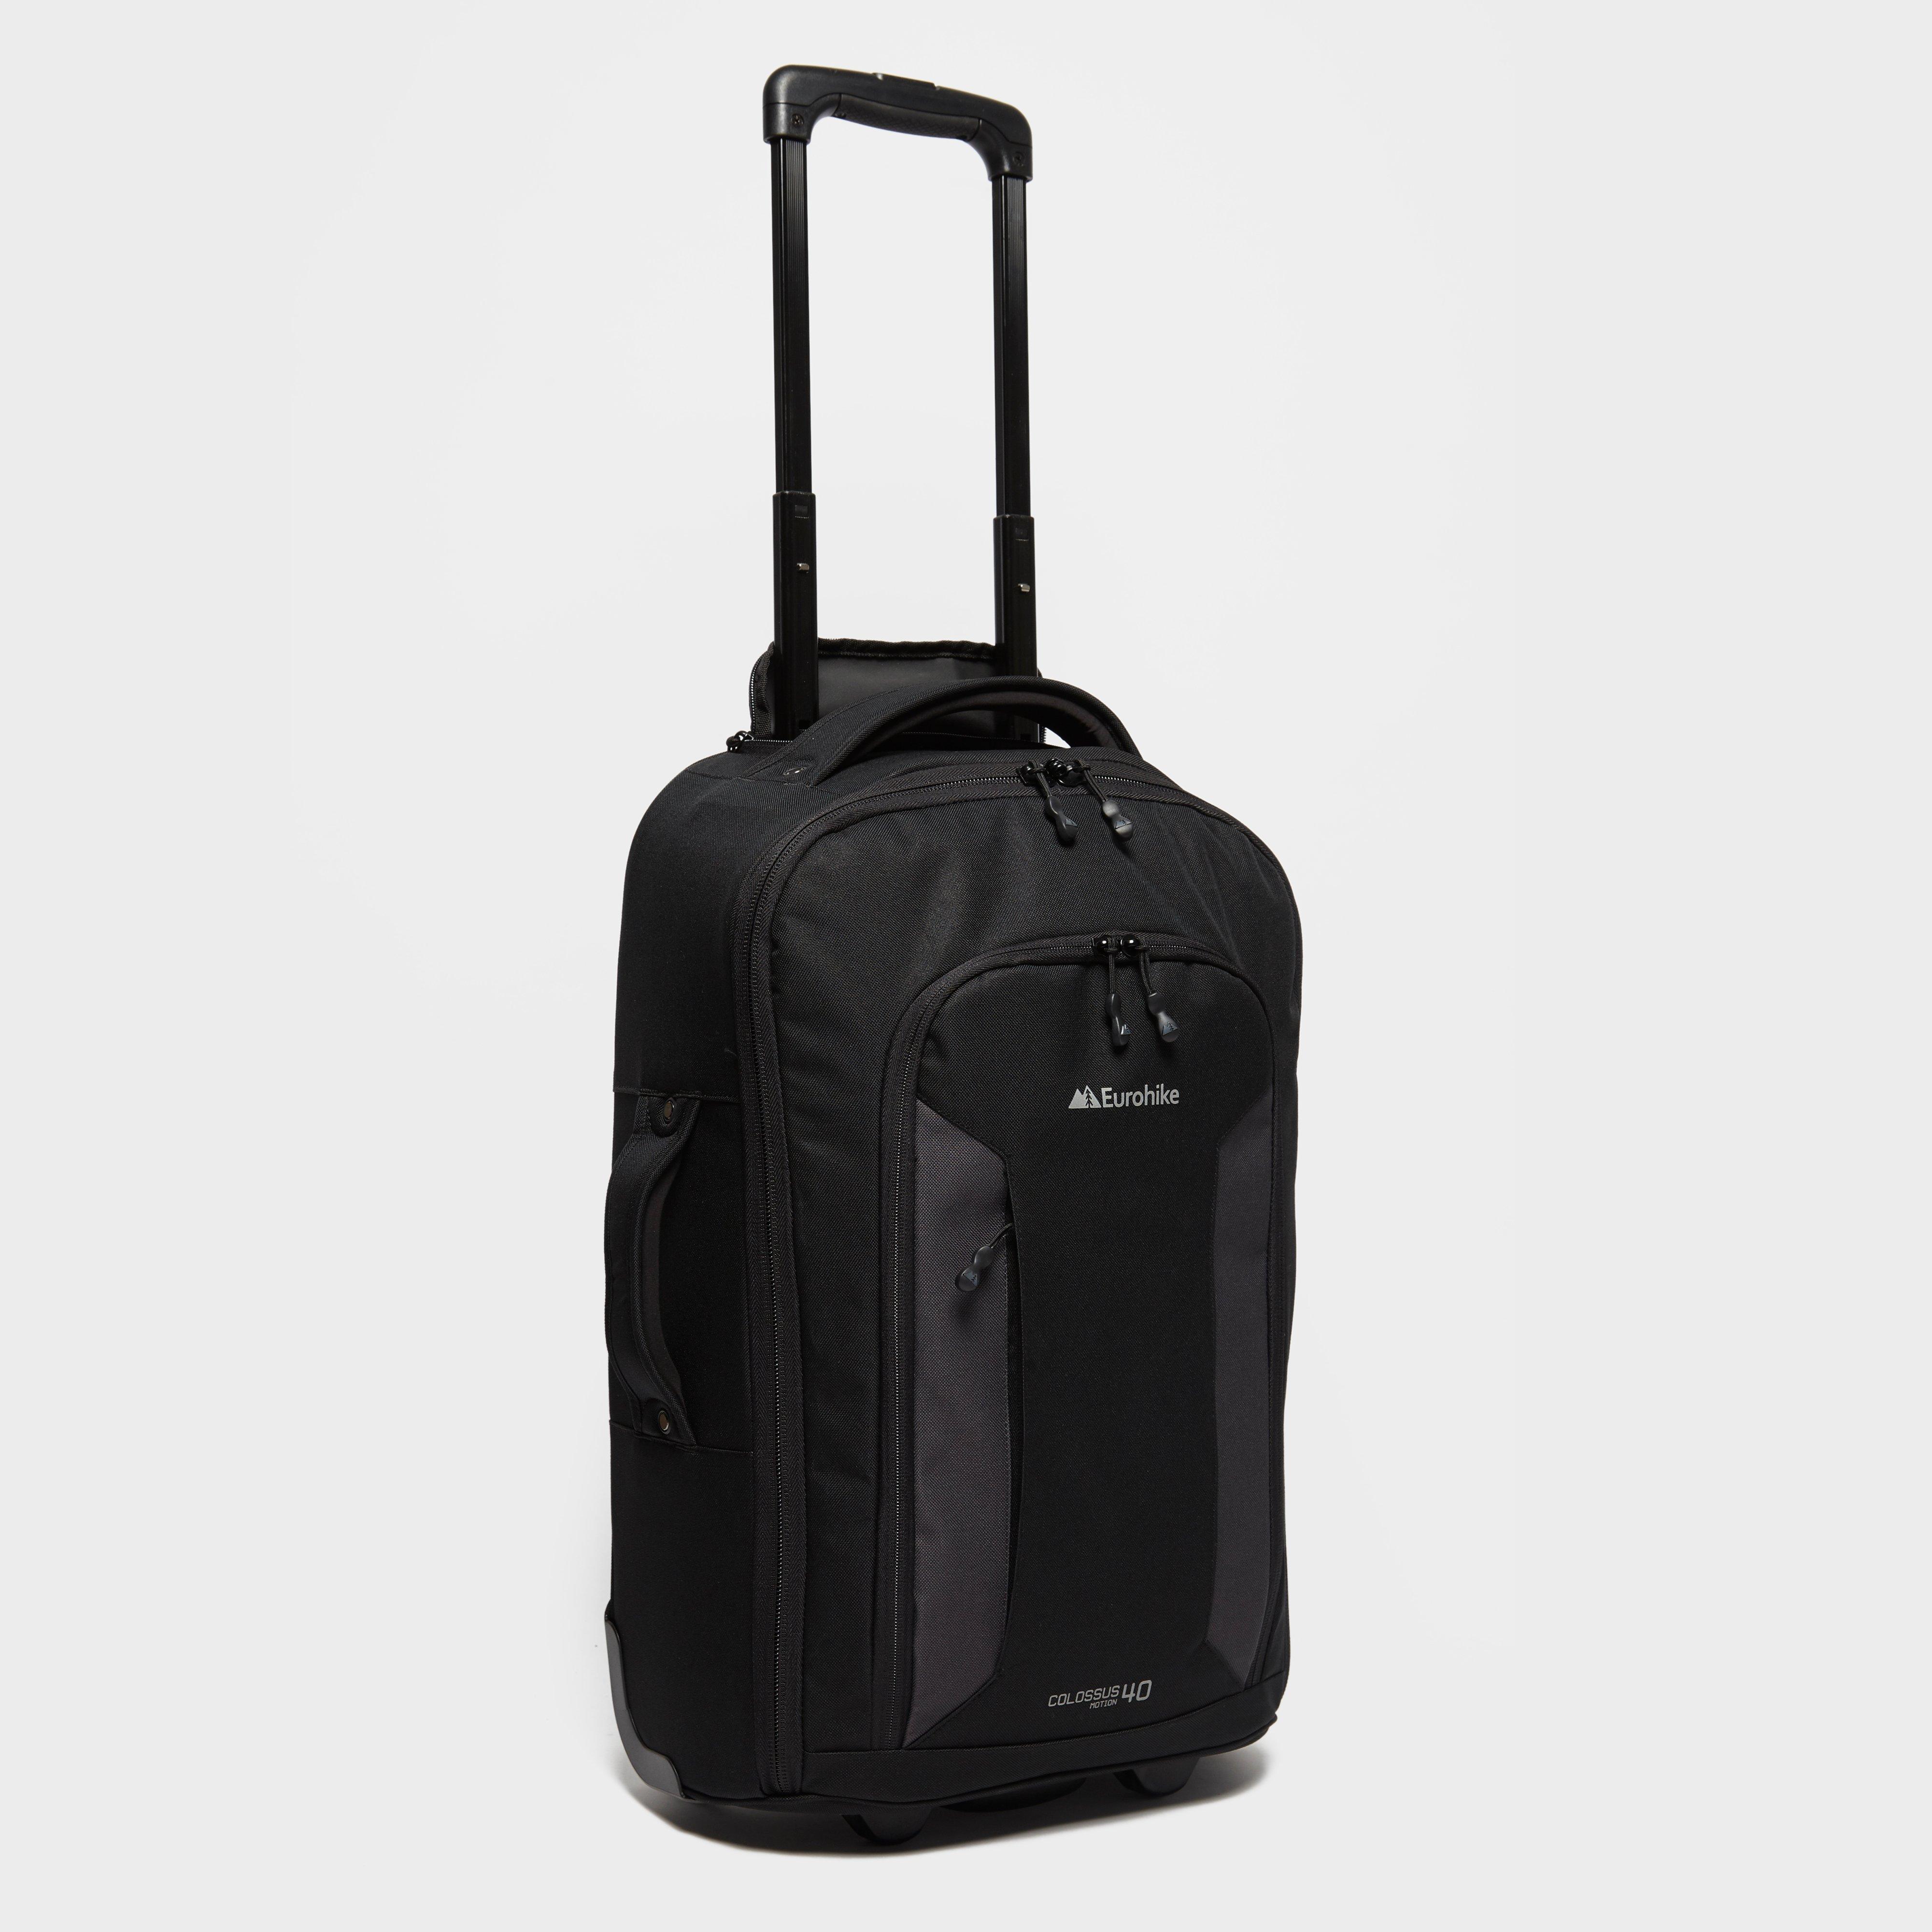 Eurohike Eurohike Colossus Motion 40 Travel Pack - Black, Black